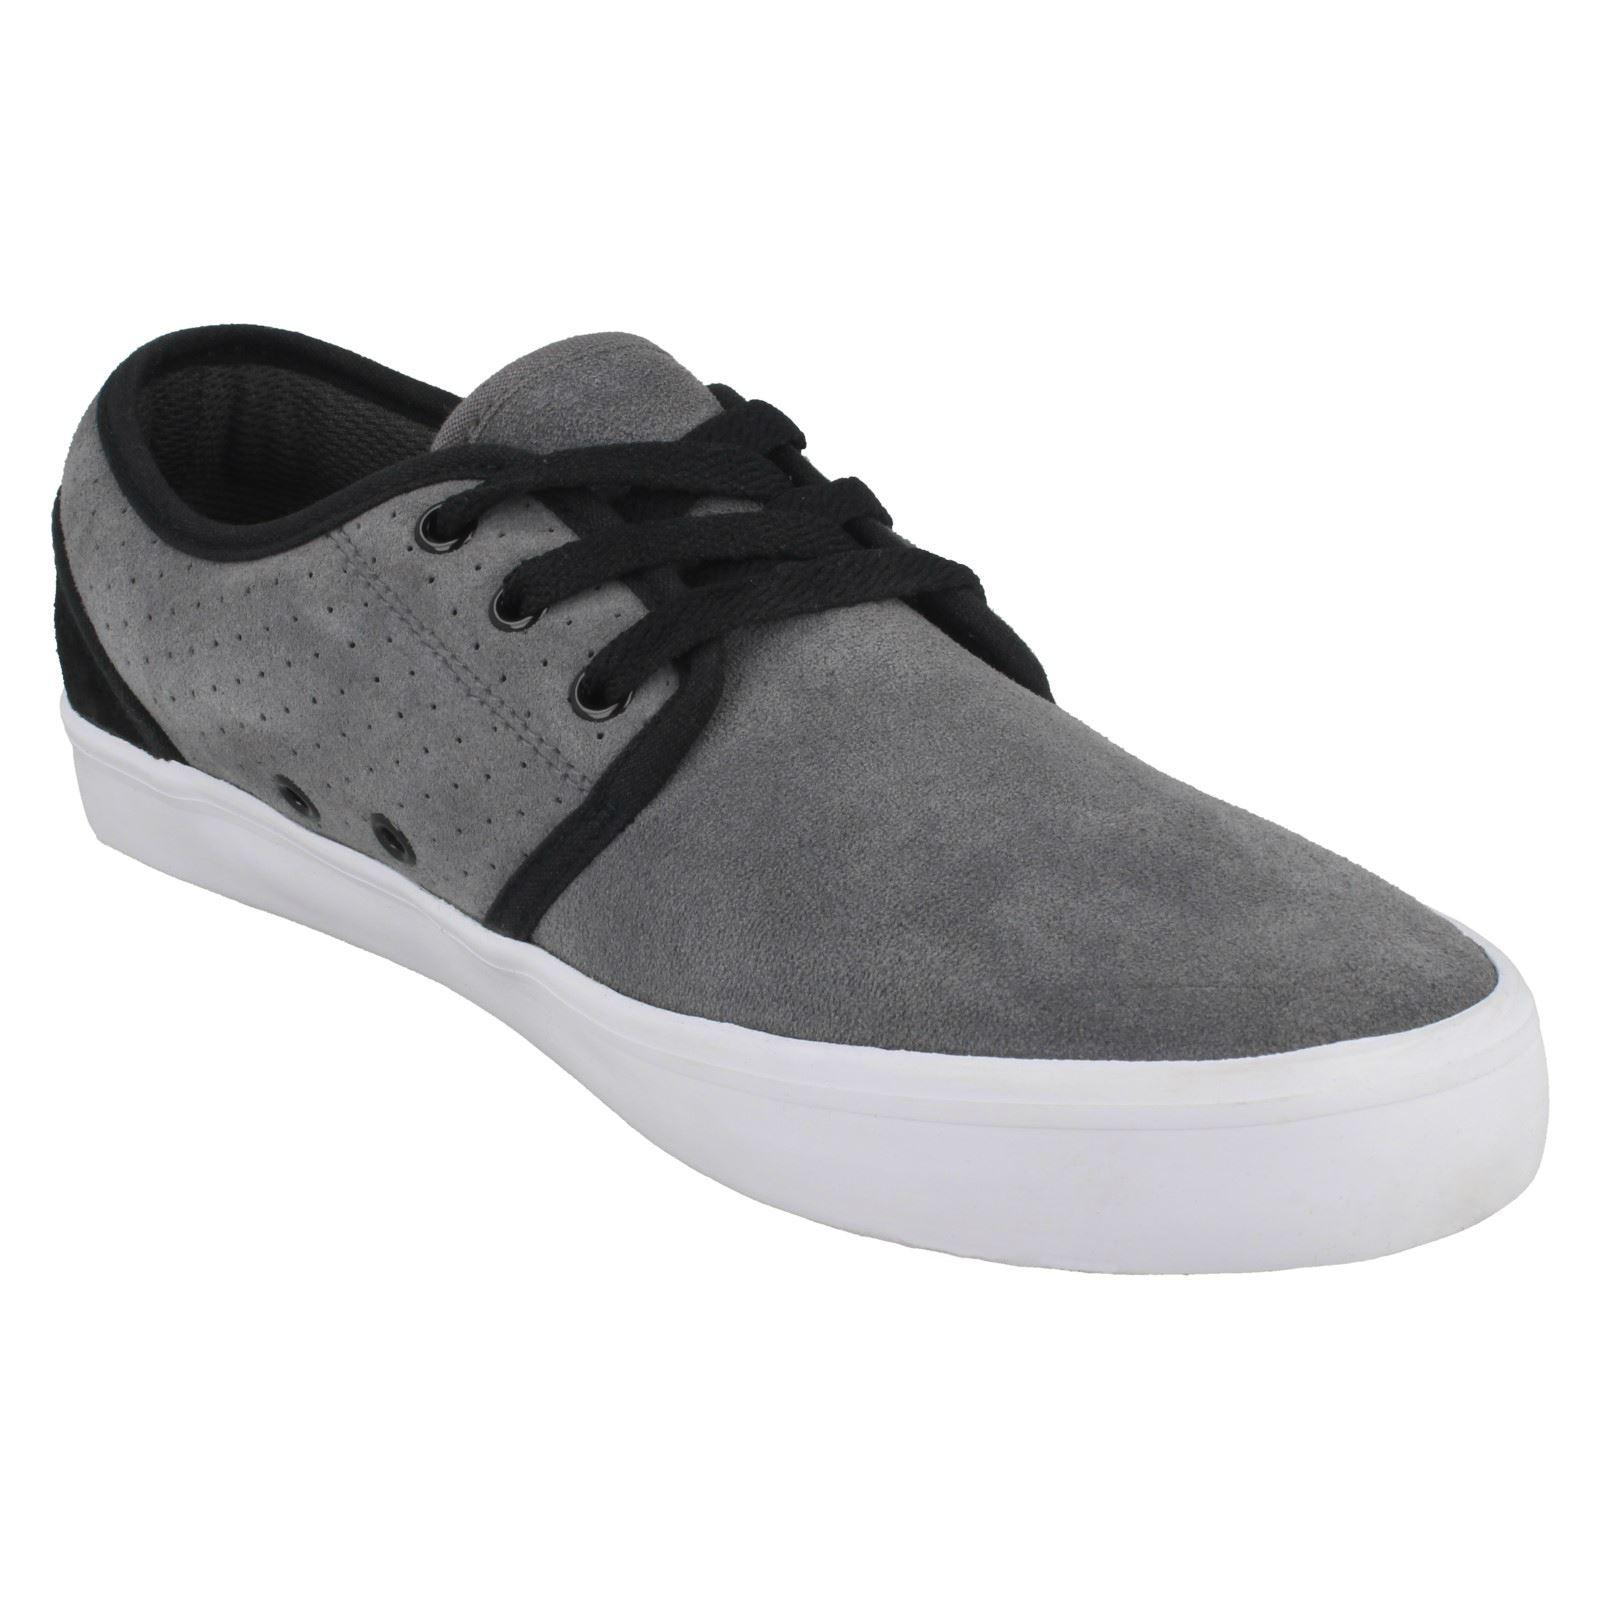 Uomo Vox Footwear Inc Skater Style Casual Slacker Lace Up Leder Schuhes Slacker Casual 1edd51